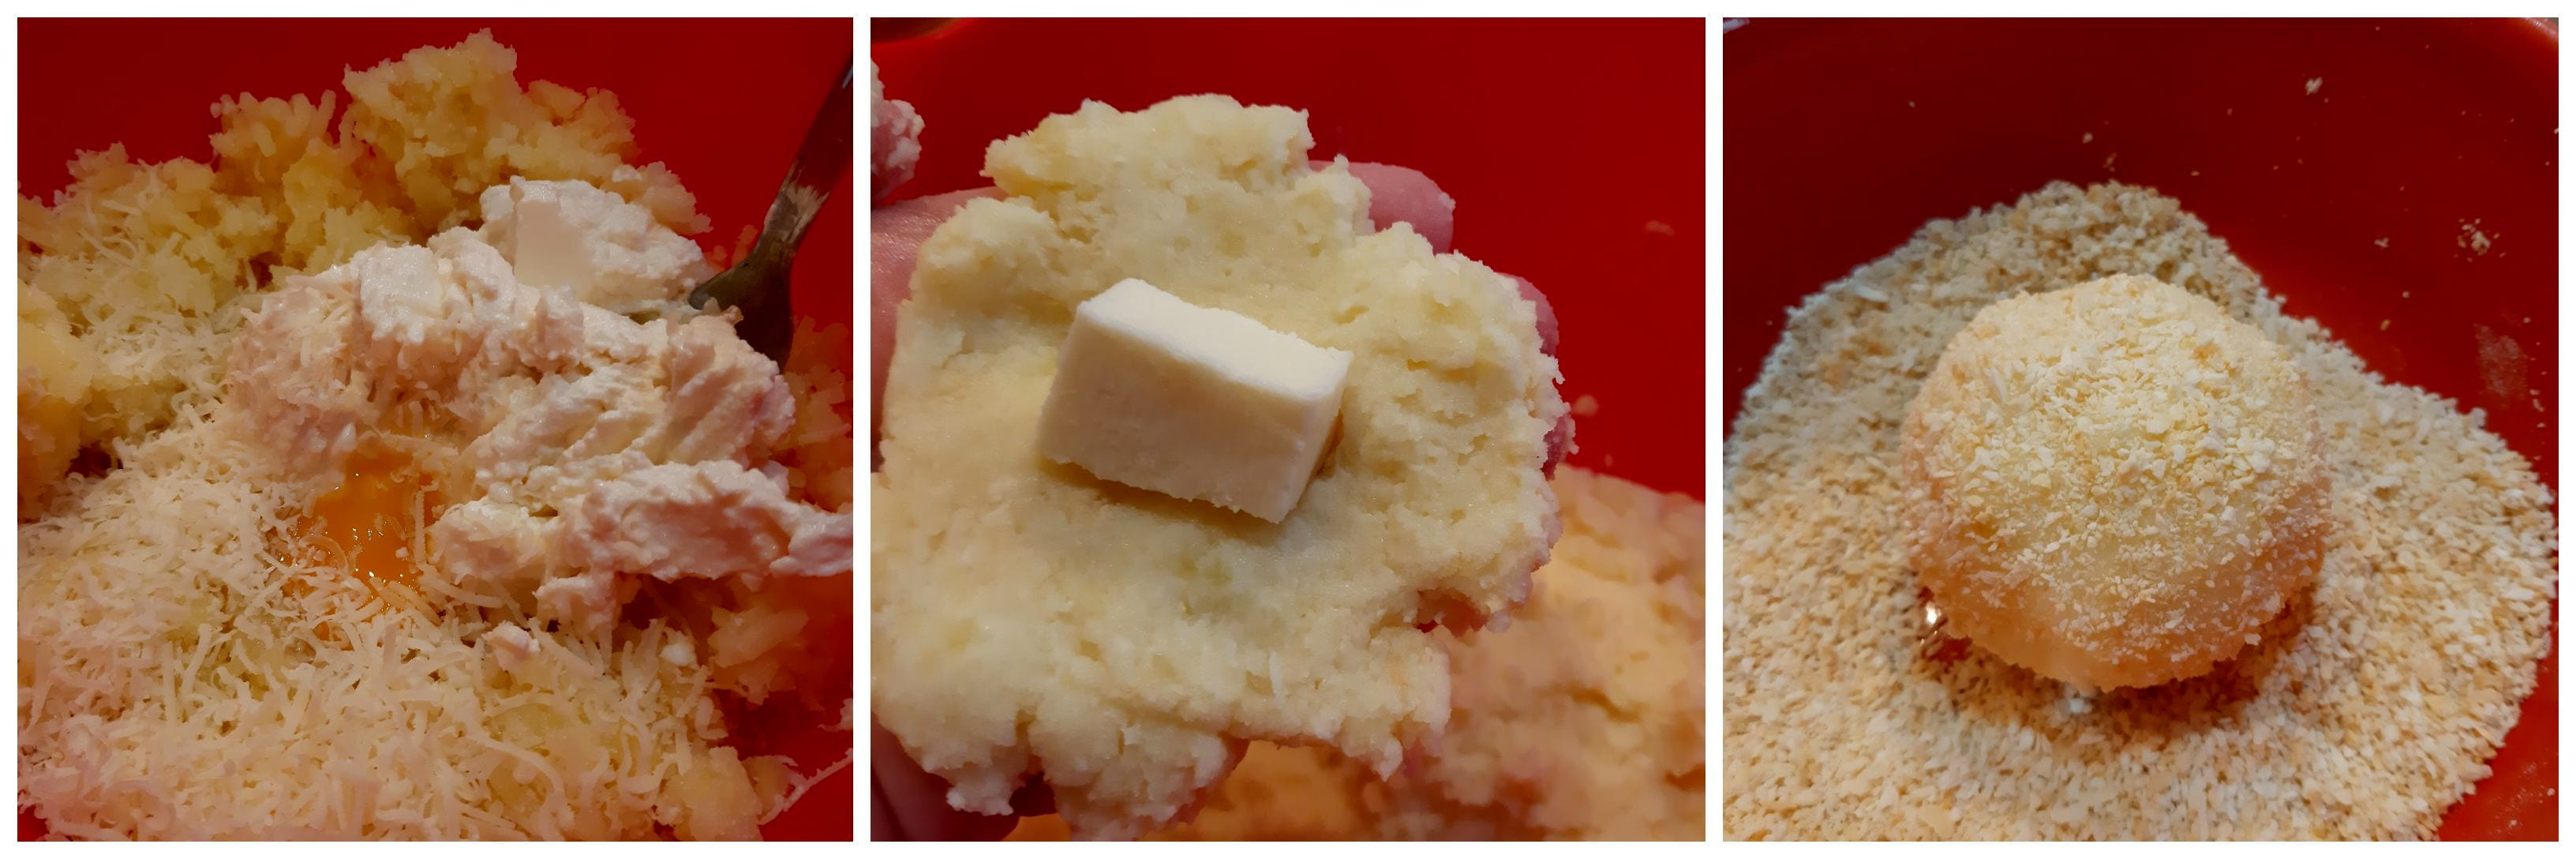 polpette patate ricotta box@VG-2